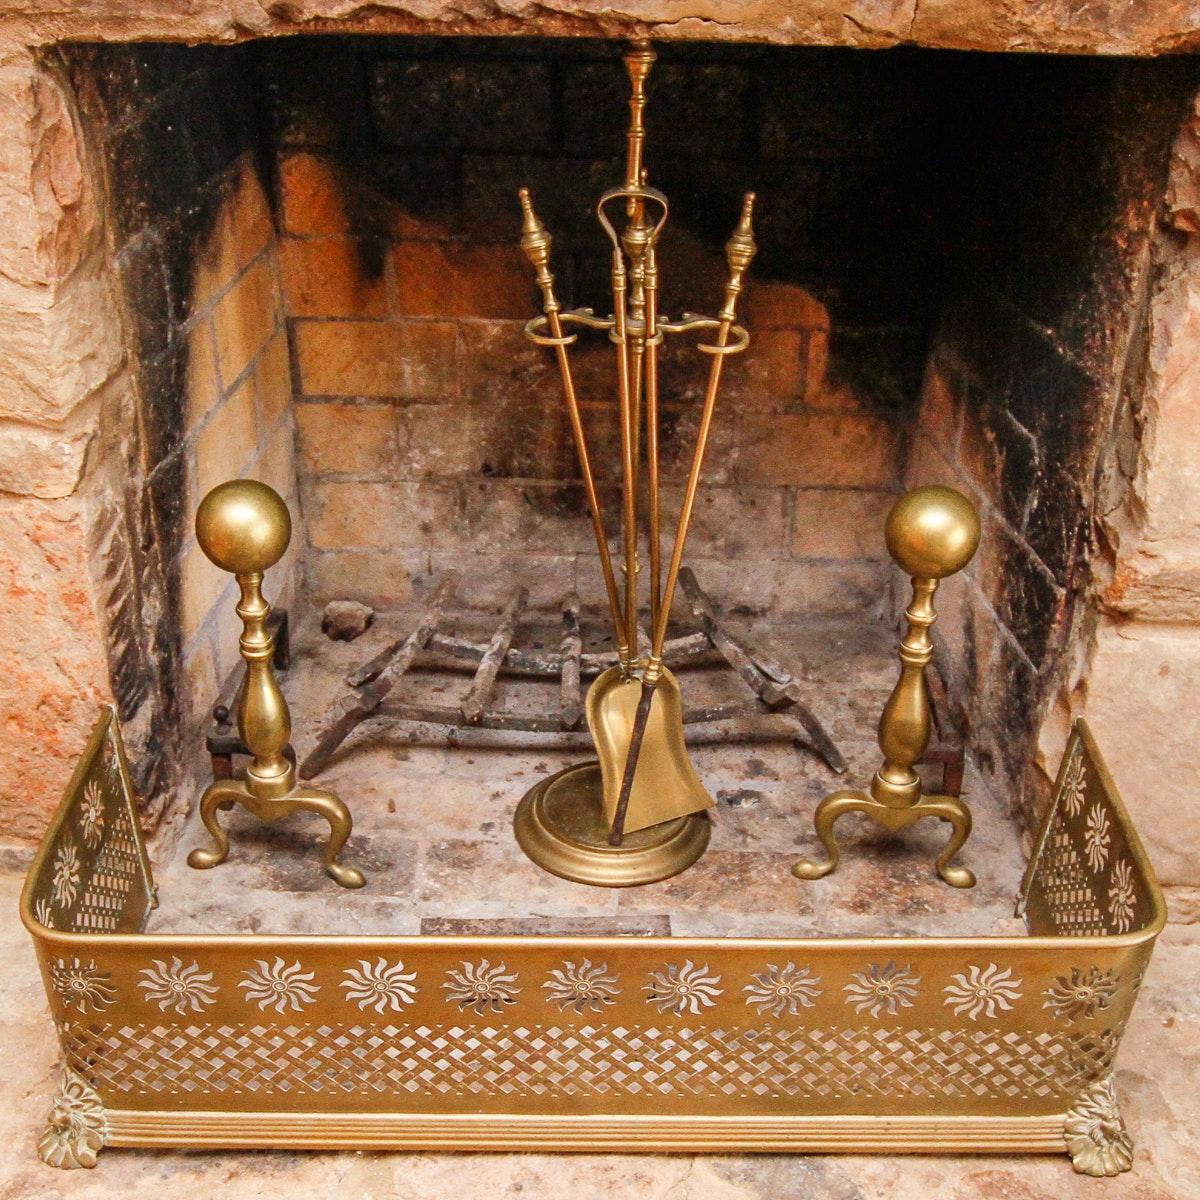 Vintage Brass Fireplace Accessories